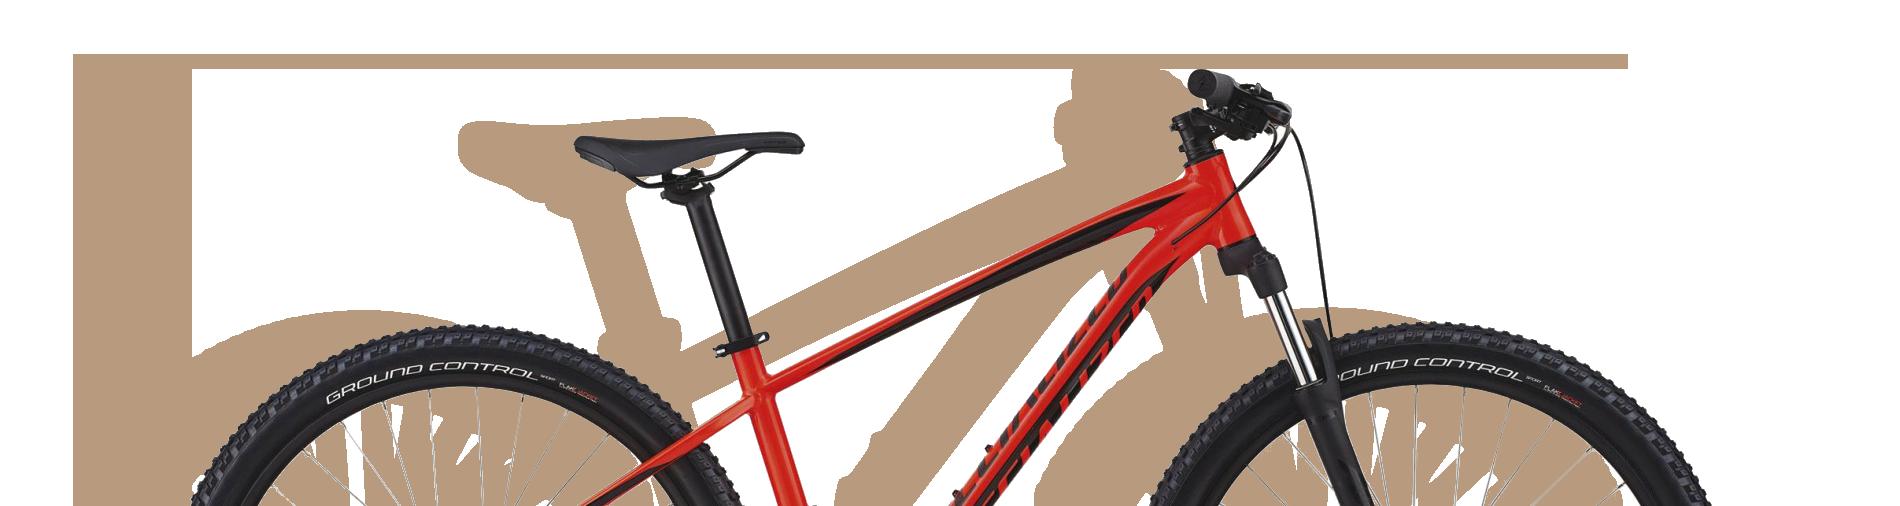 Bicikl Rental